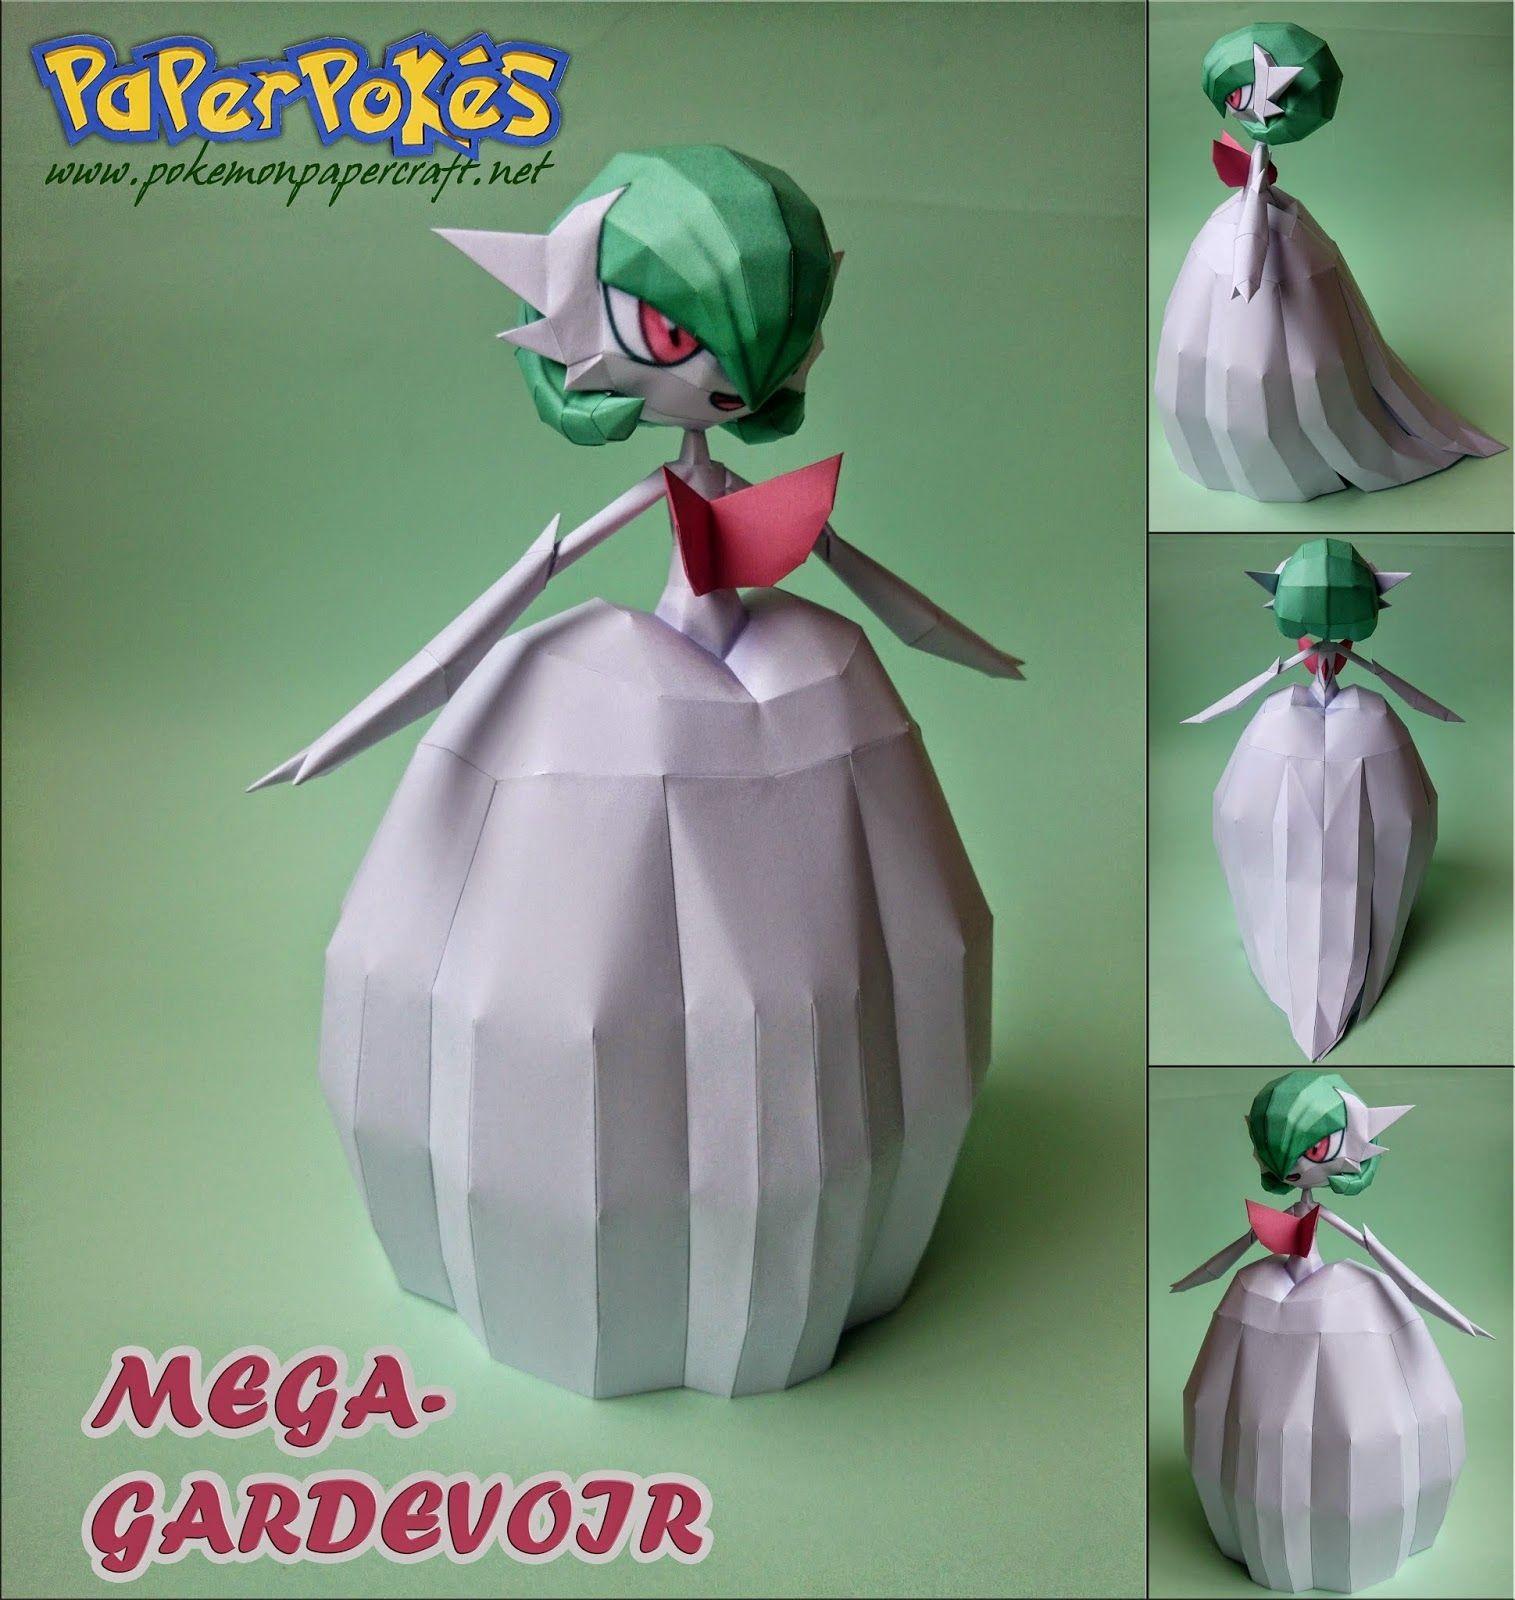 Papercraft Characters Paperpokés Pokémon Papercrafts Mega Gardevoir